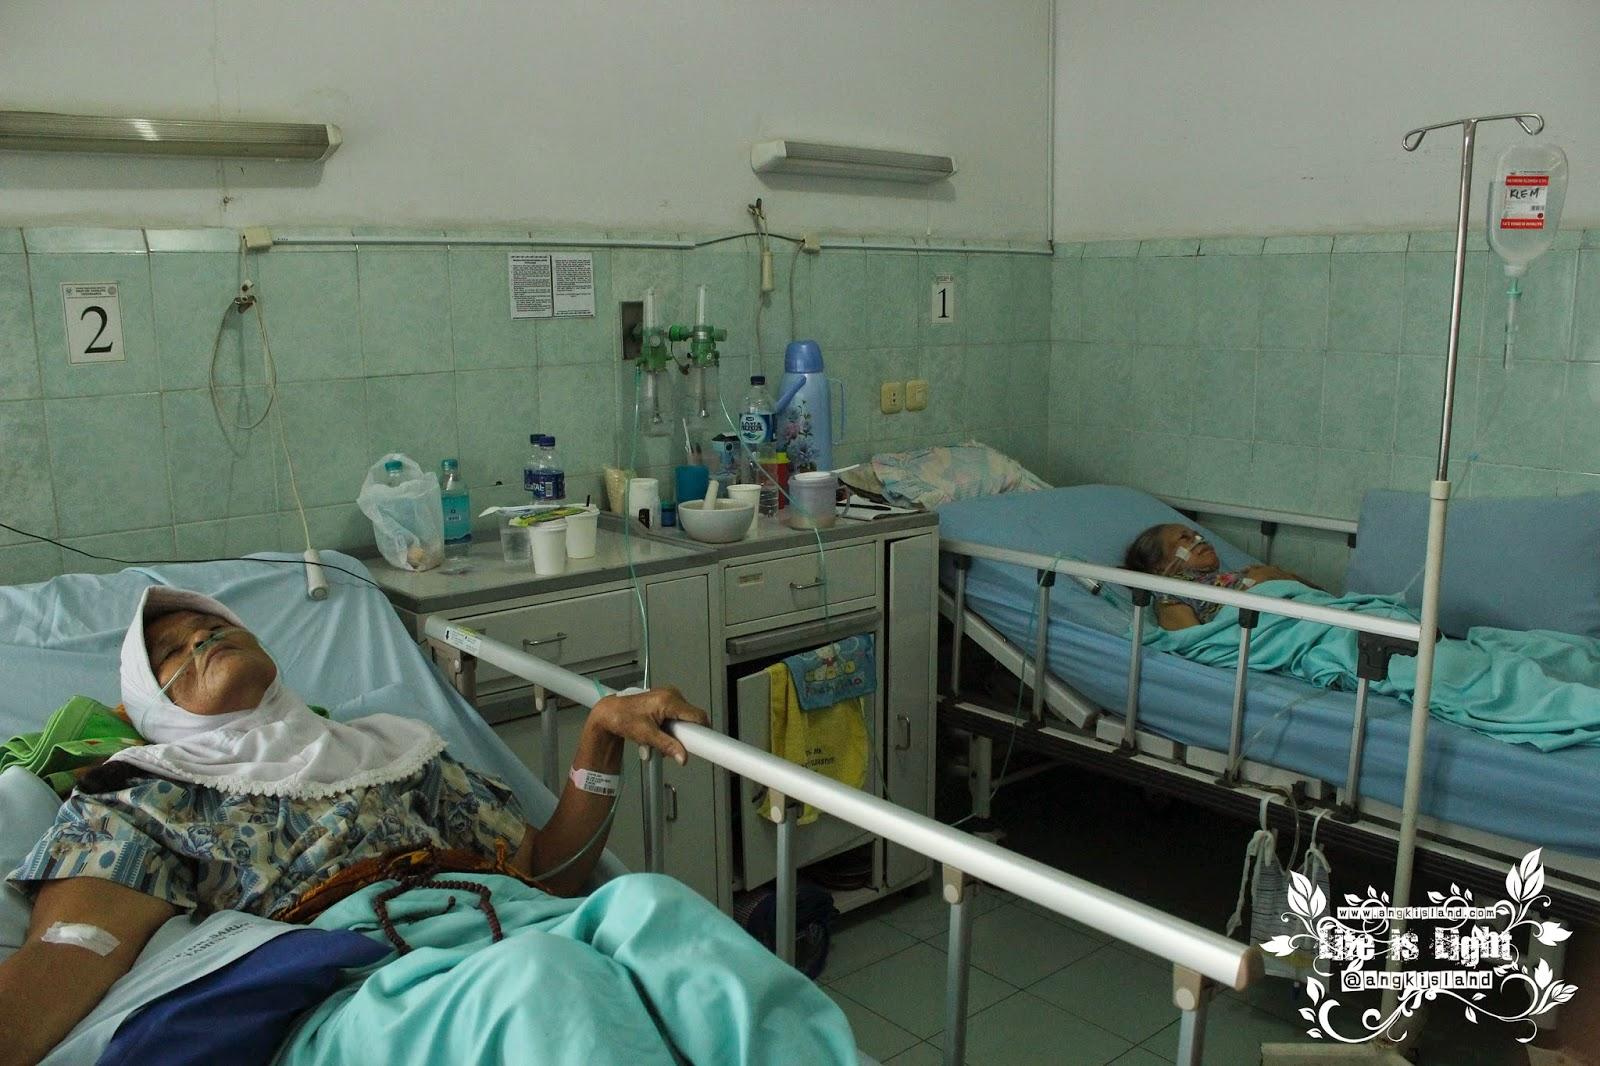 rumah sakit sarjito jogjakarta